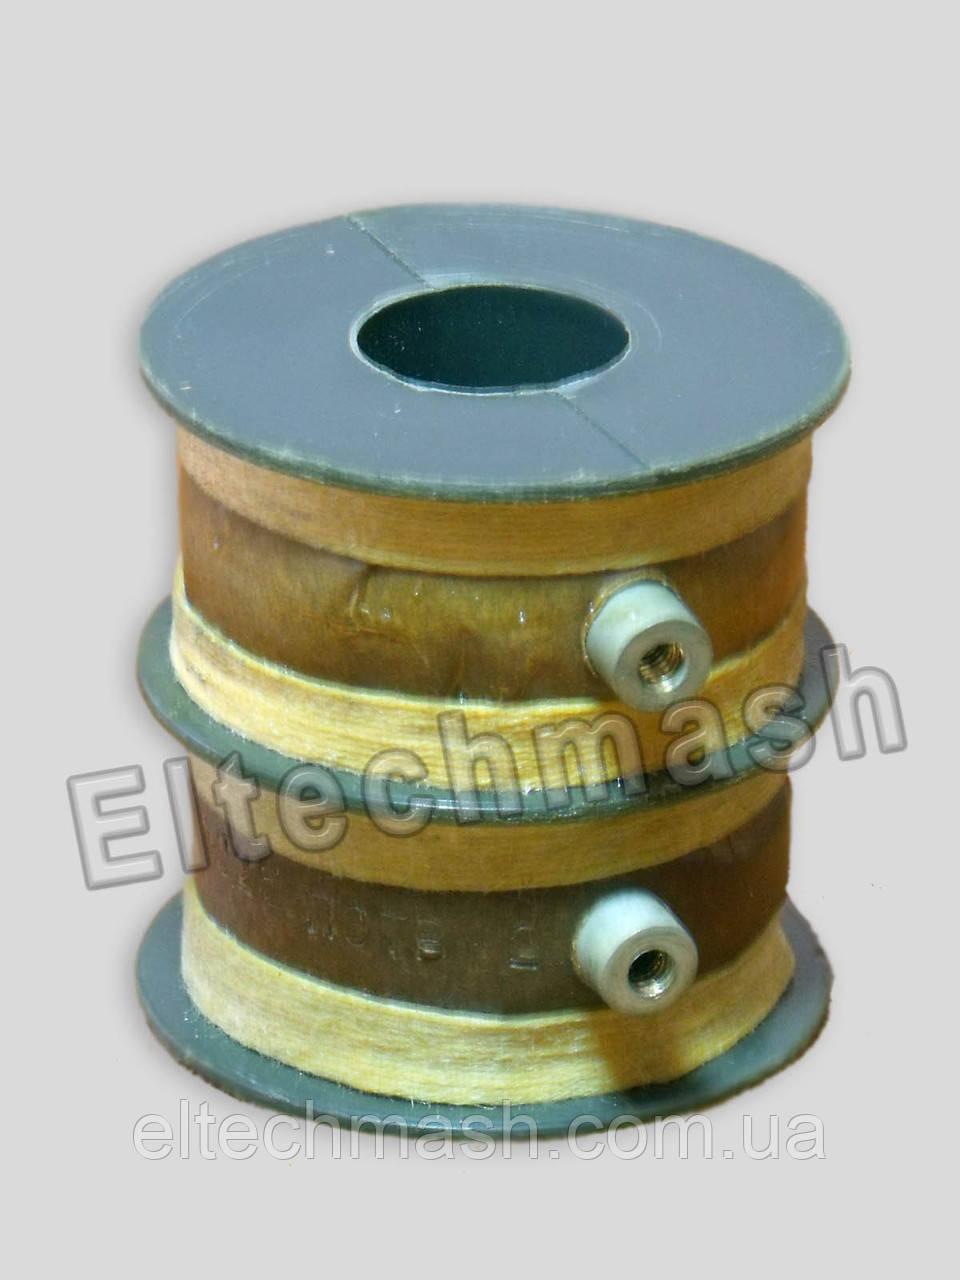 Котушка 5ТХ.520.026.4 до вентиля ВВ-3 (110В)